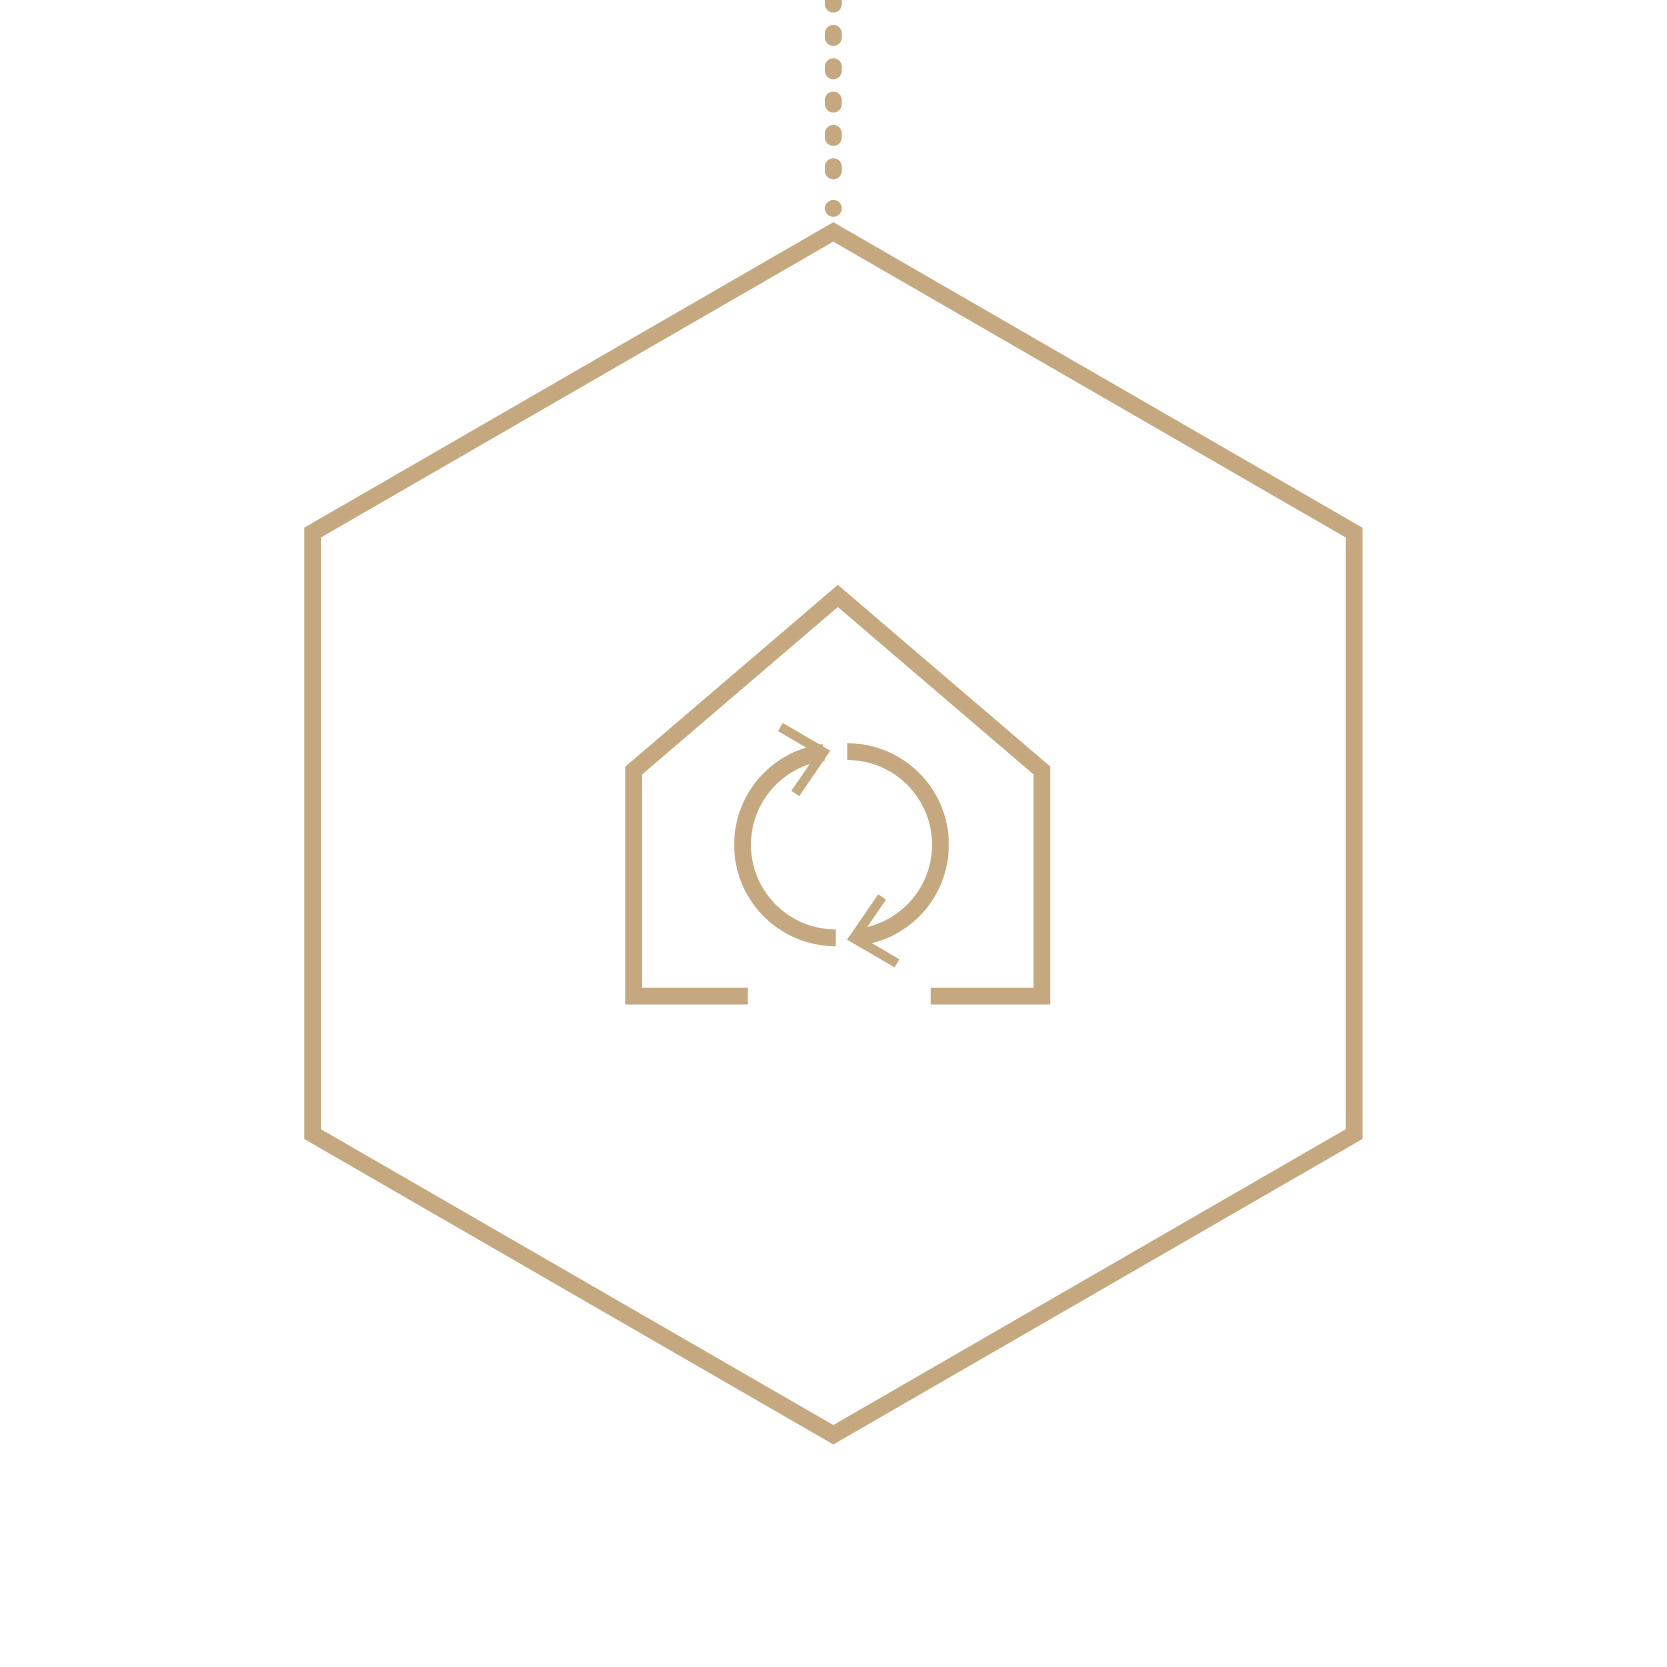 icon-set-lijntje-06.png